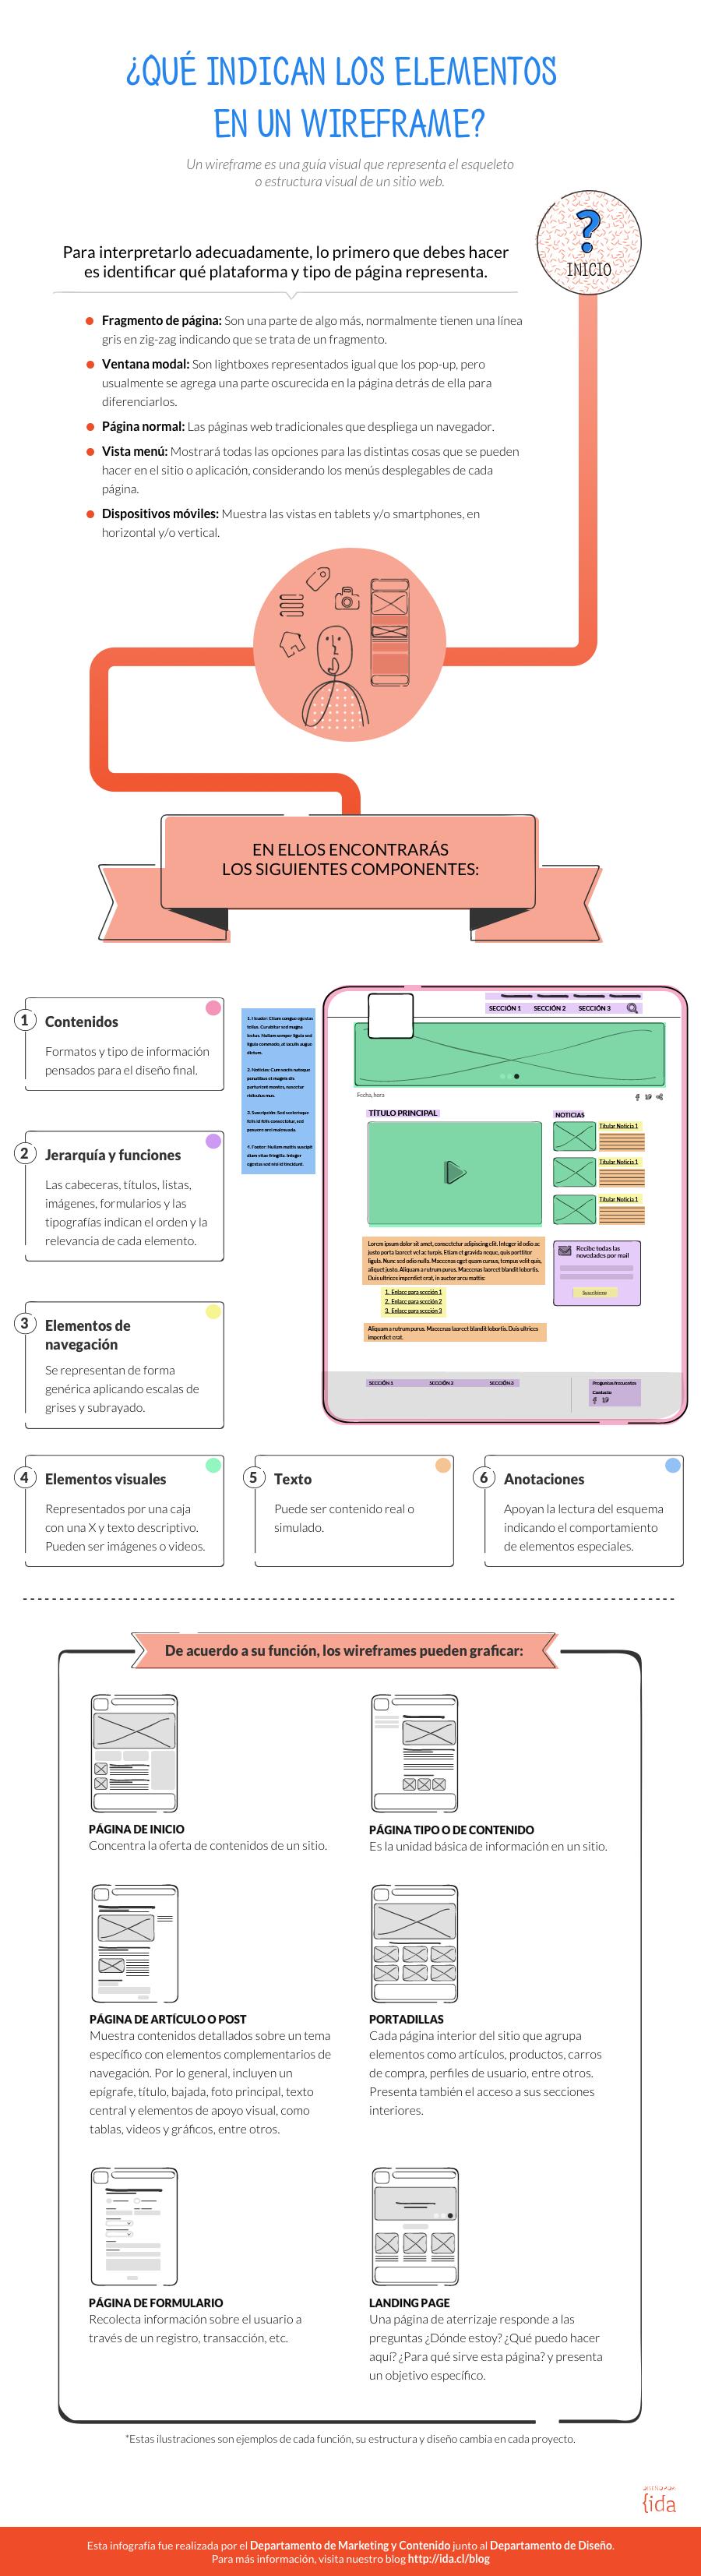 infografía sobre wireframes